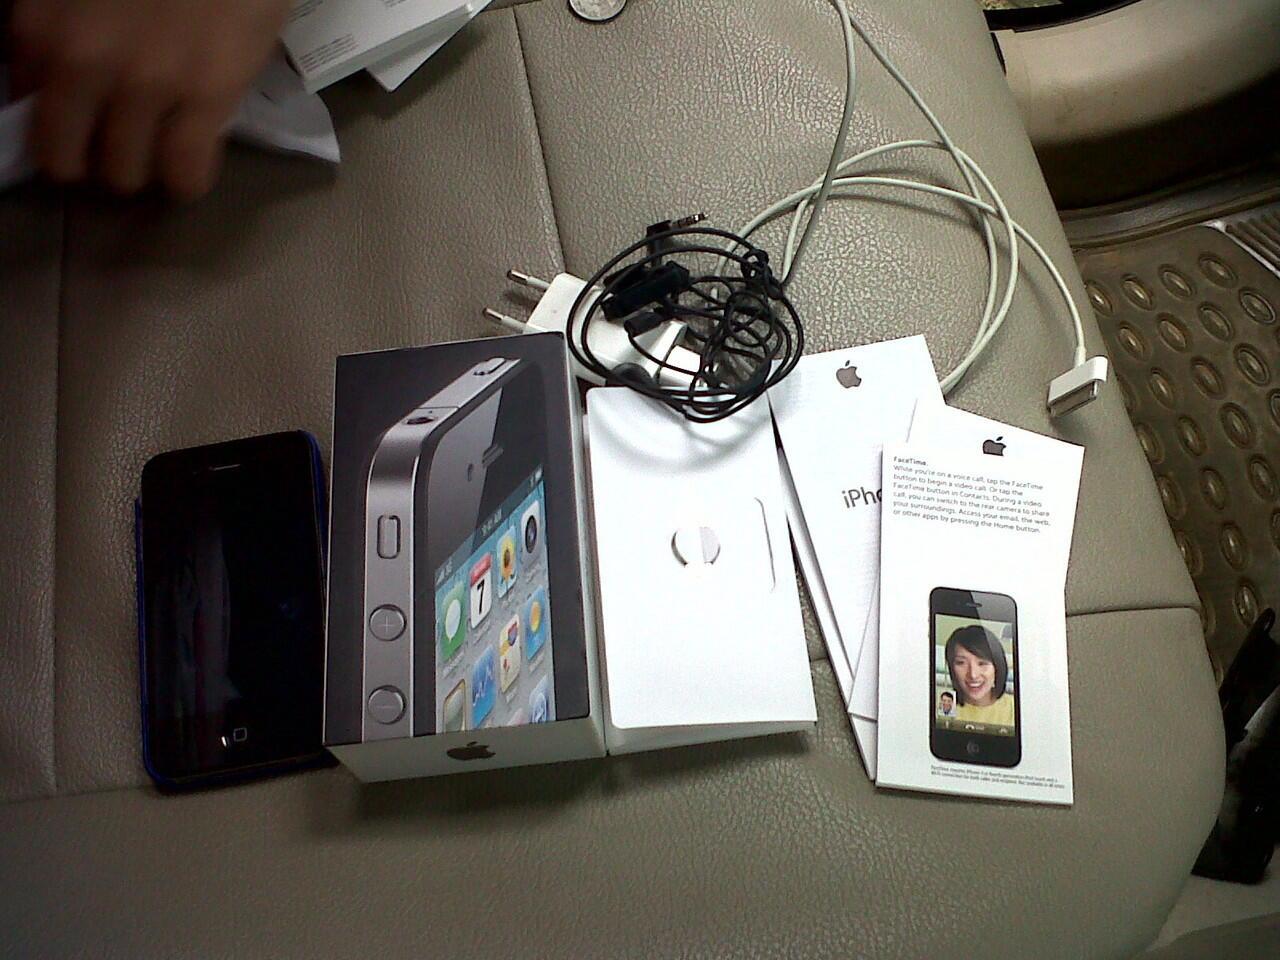 IPHONE 4 16GB MULUS! JUAL CEPAT!!